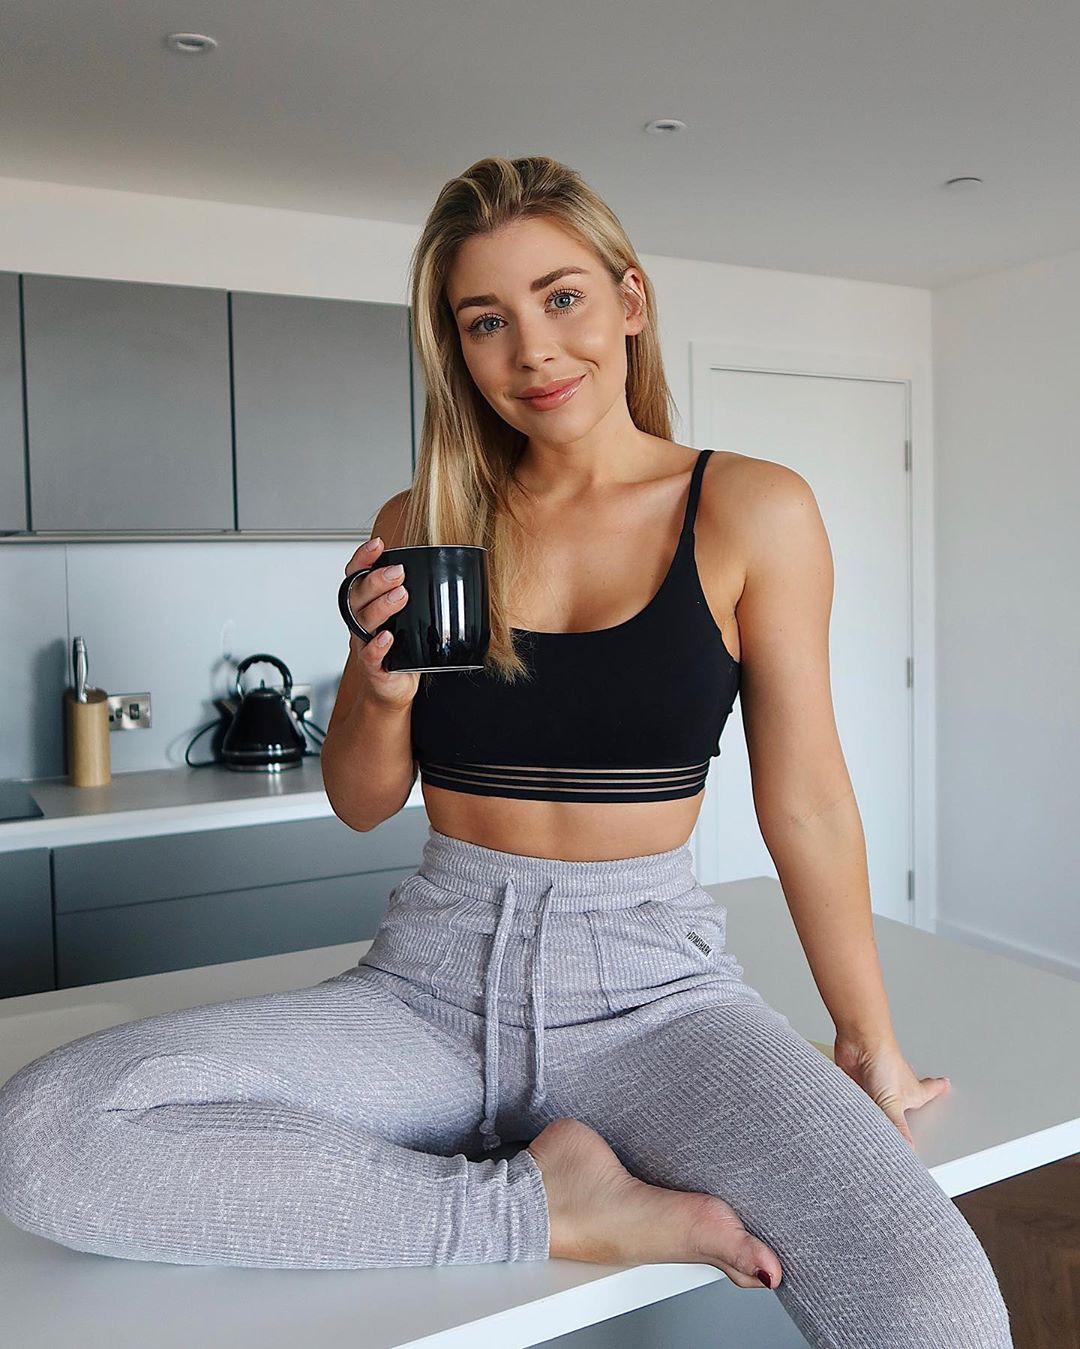 Sophie active pants, sportswear, leggings outfit ideas